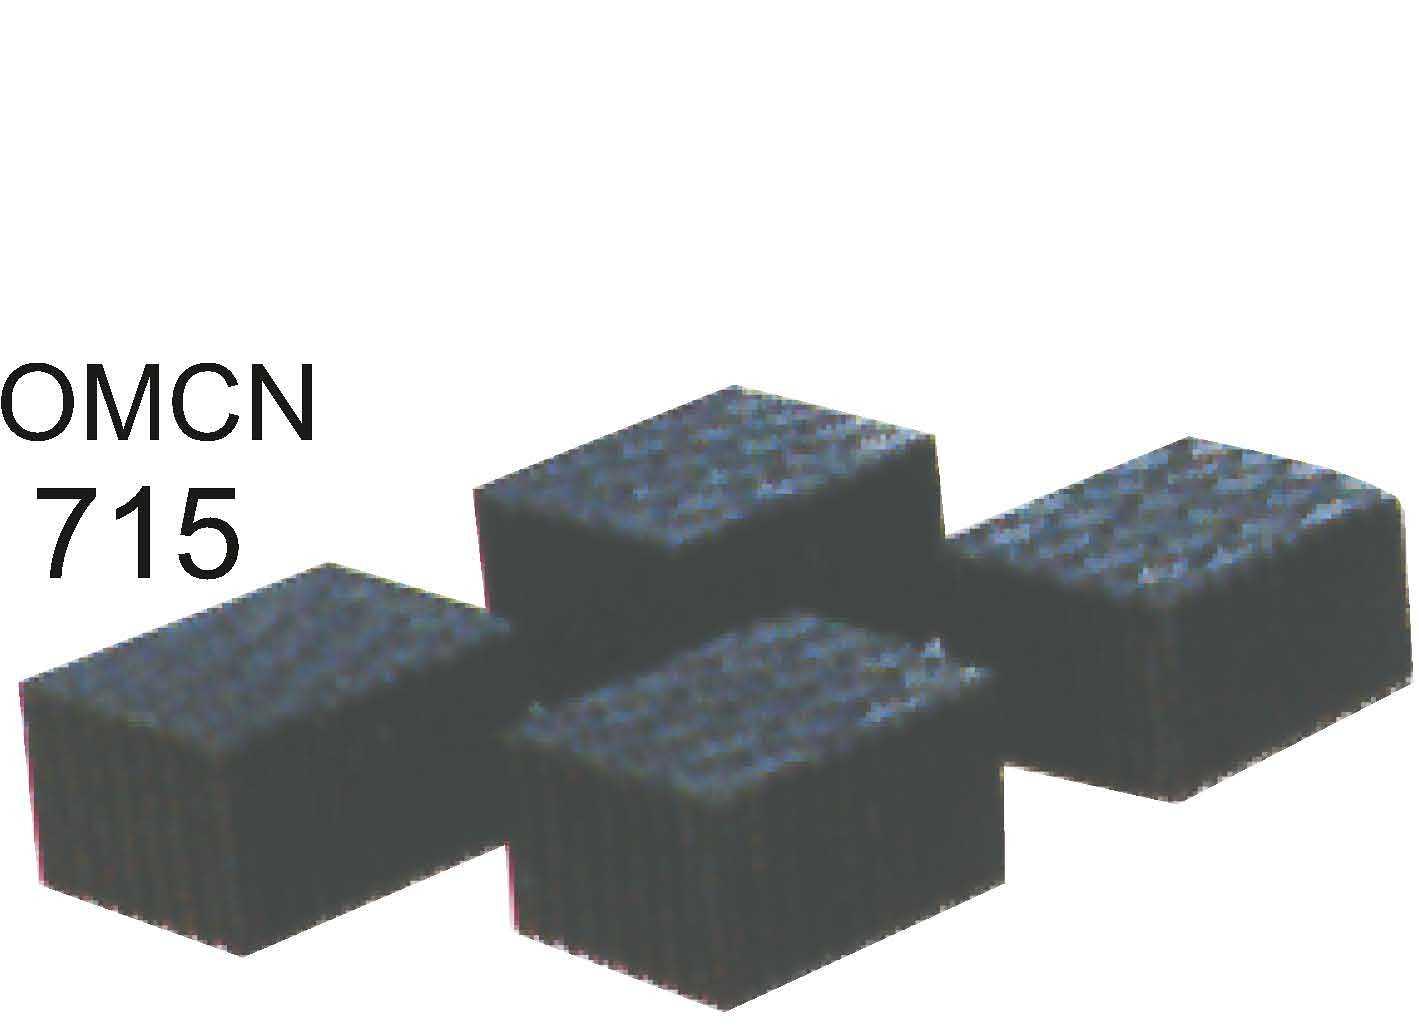 OMCN 715